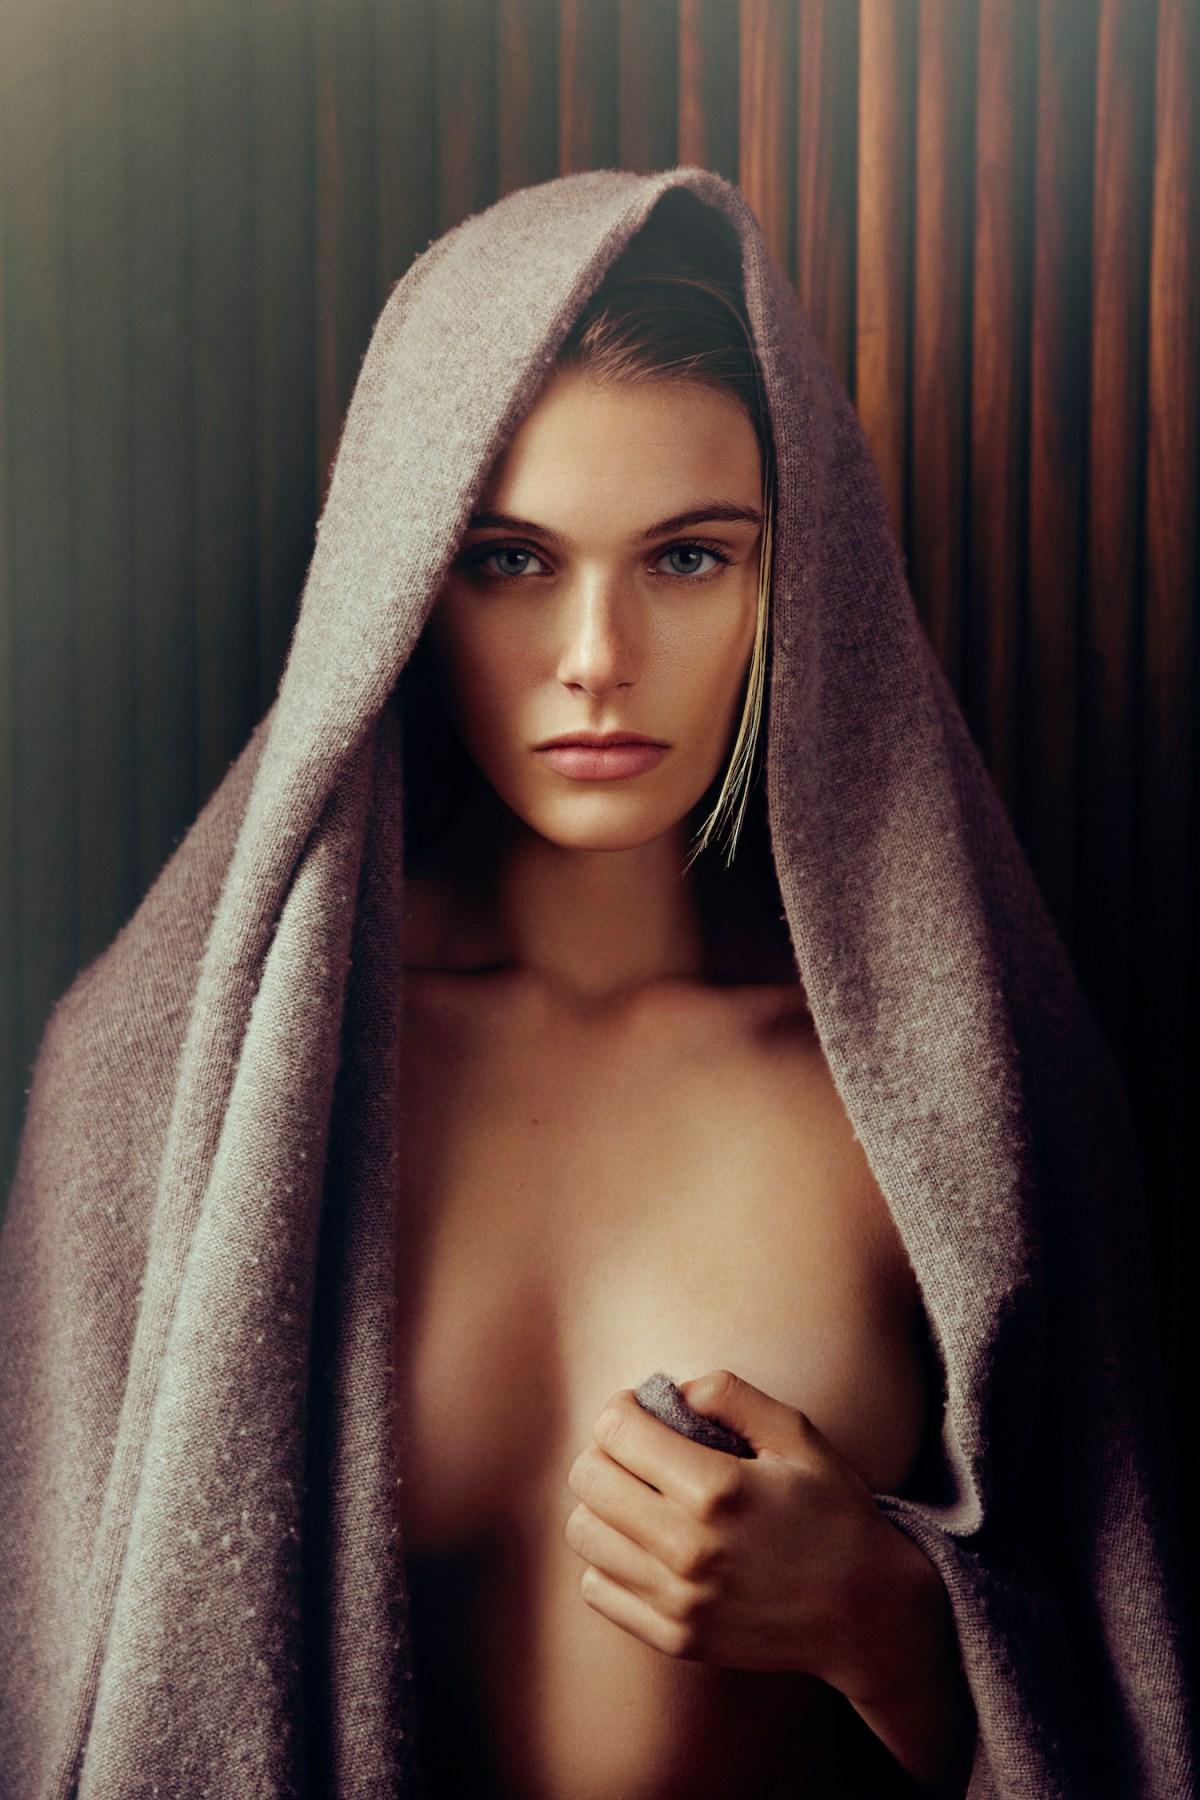 Madison Headrick by Randall Slavin for Portraits Of Girls